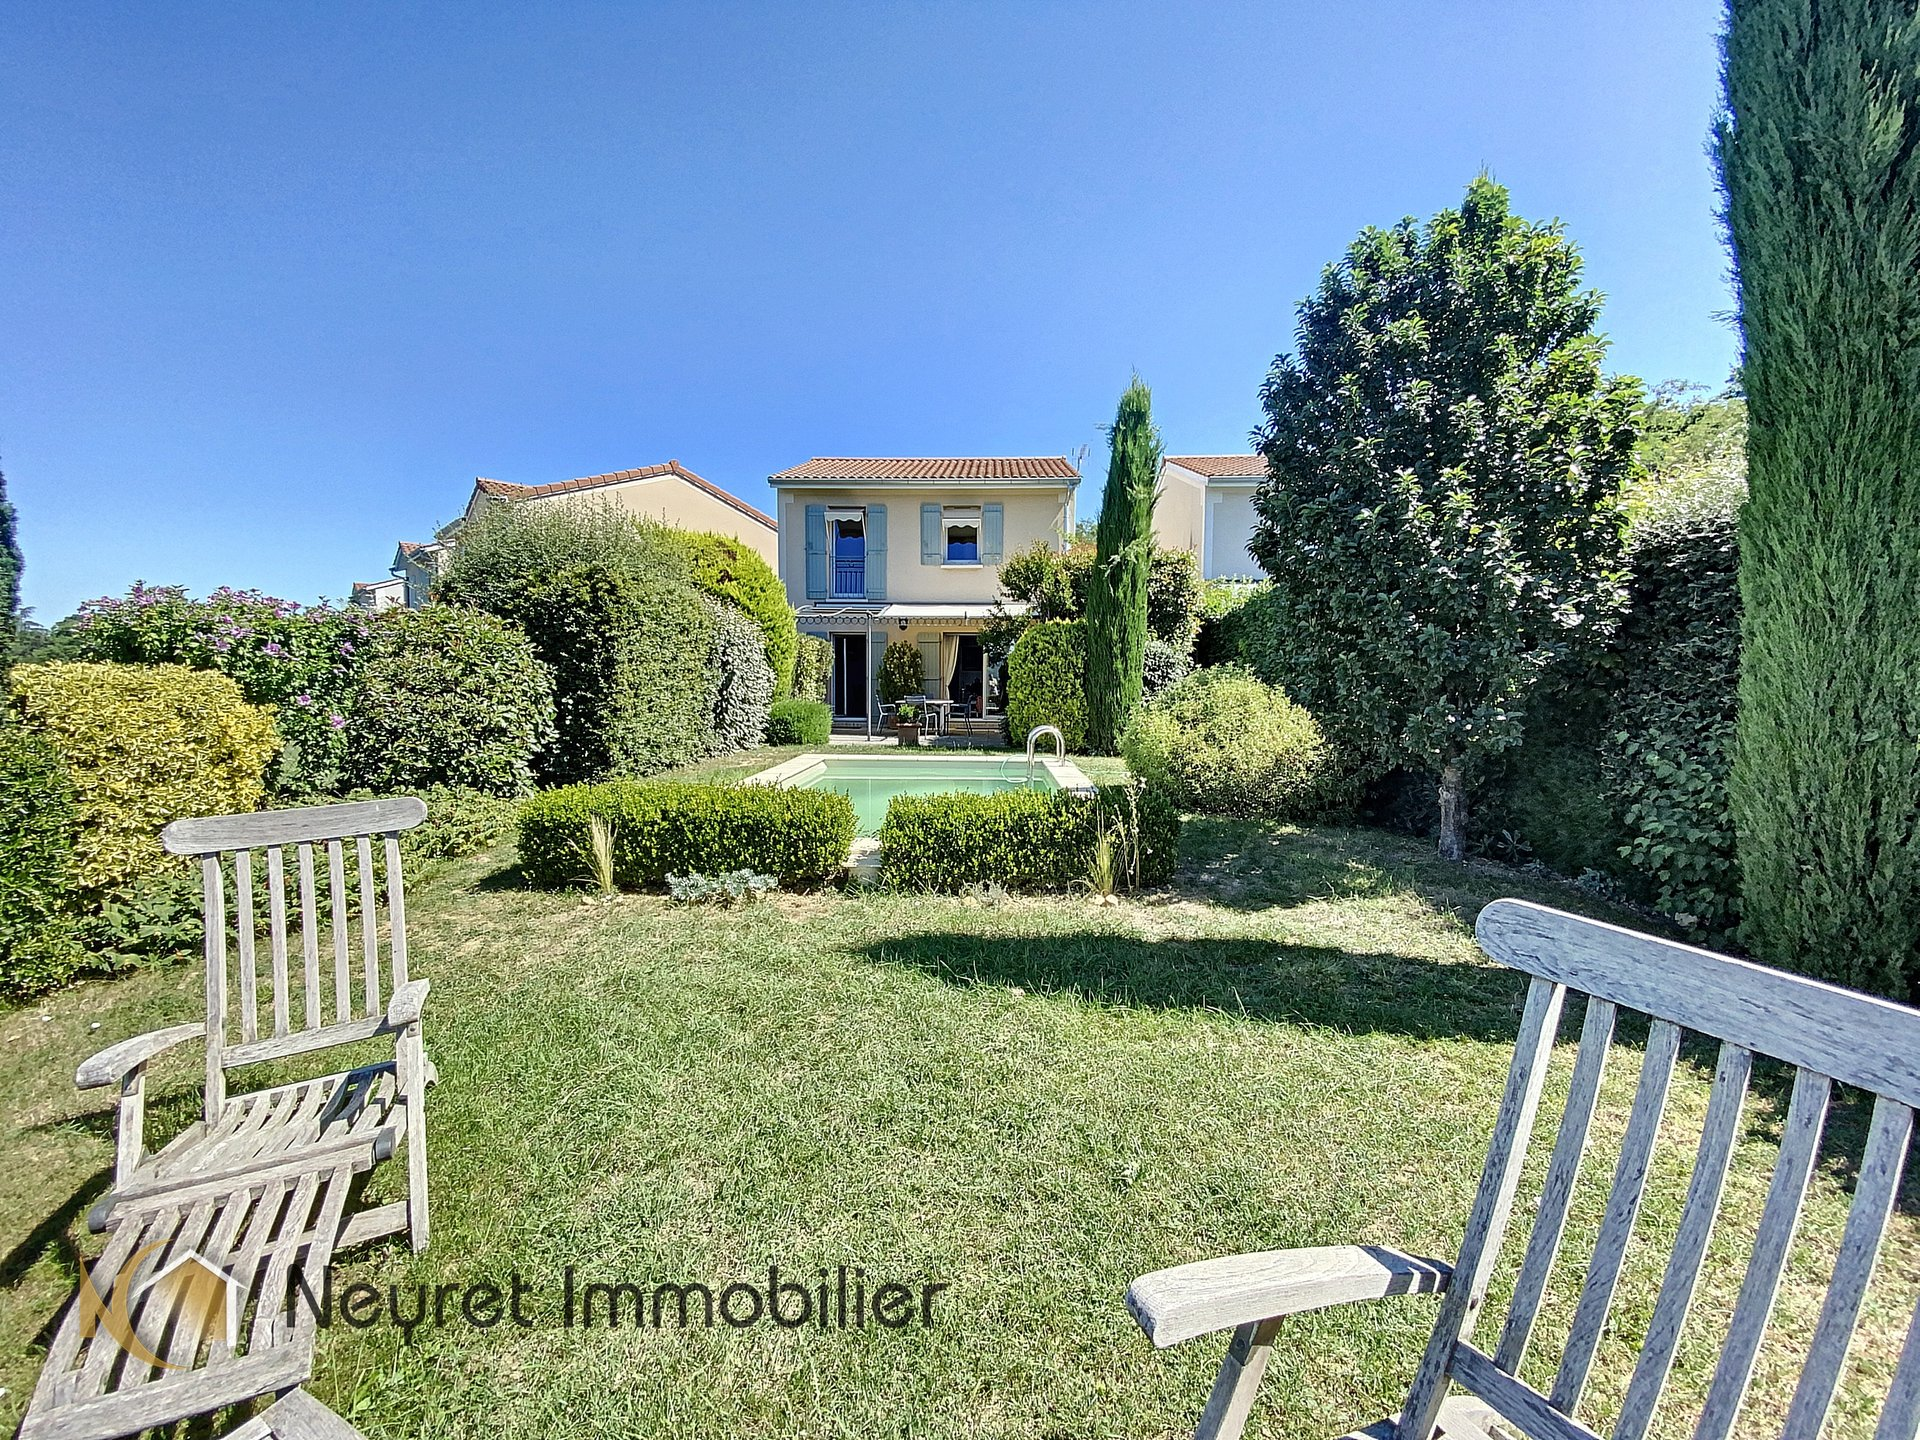 villa avec piscine les hauts de Neuville s/ saone